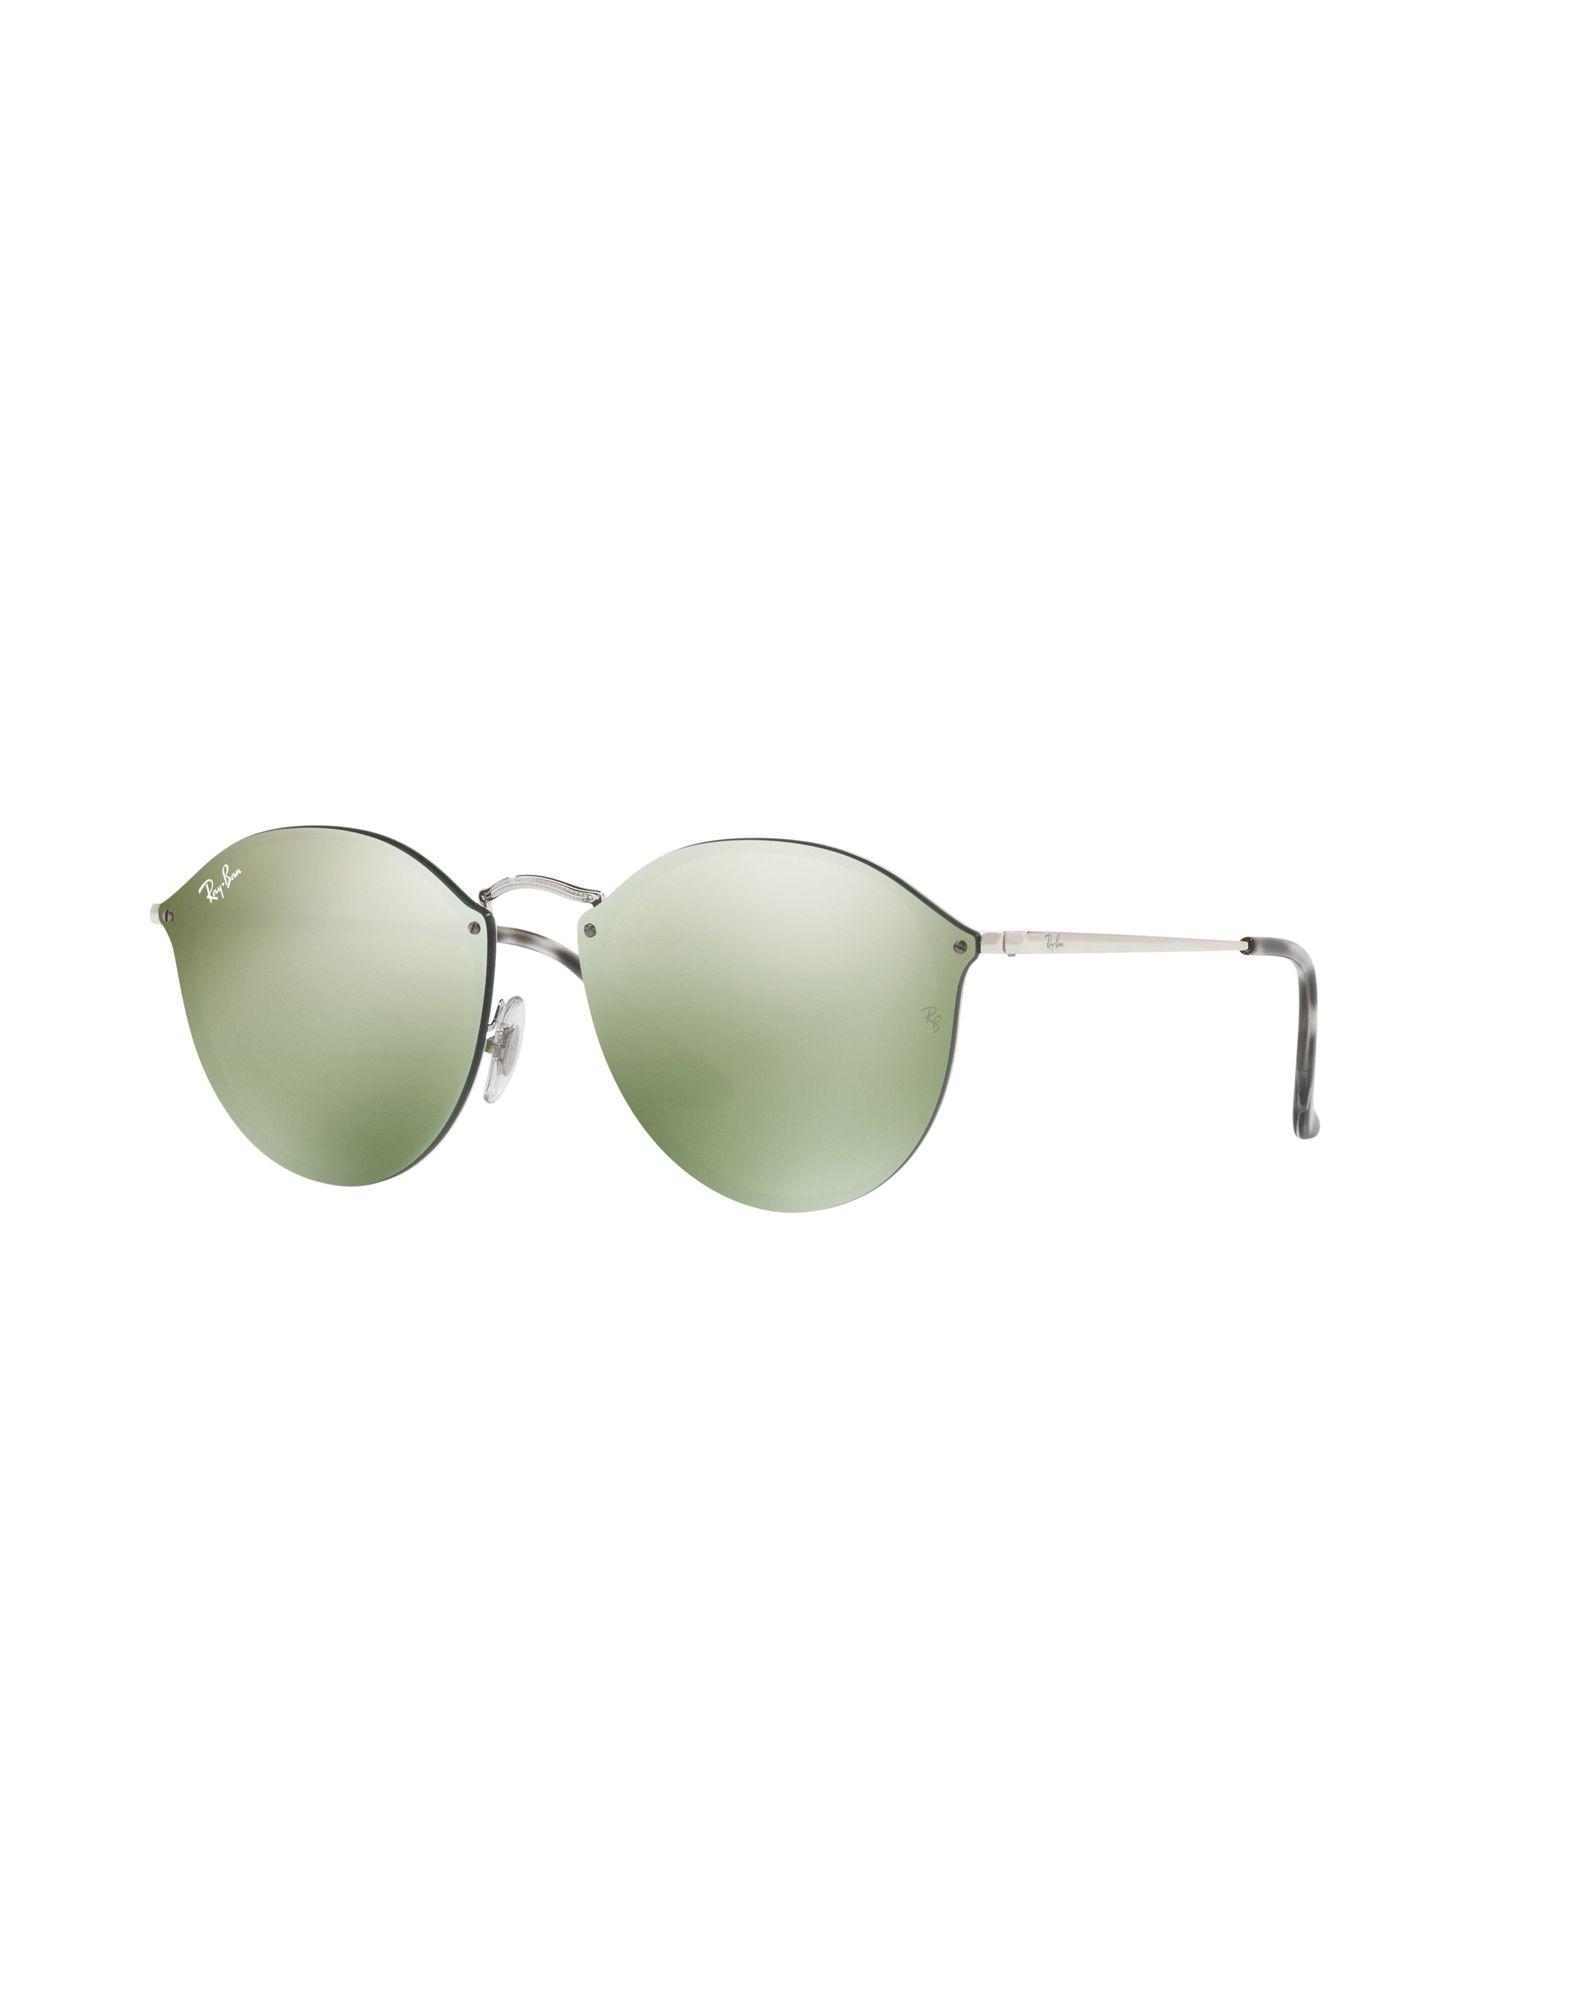 Occhiali Da Sole Ray-Ban Rb3574n - Uomo - Acquista online su